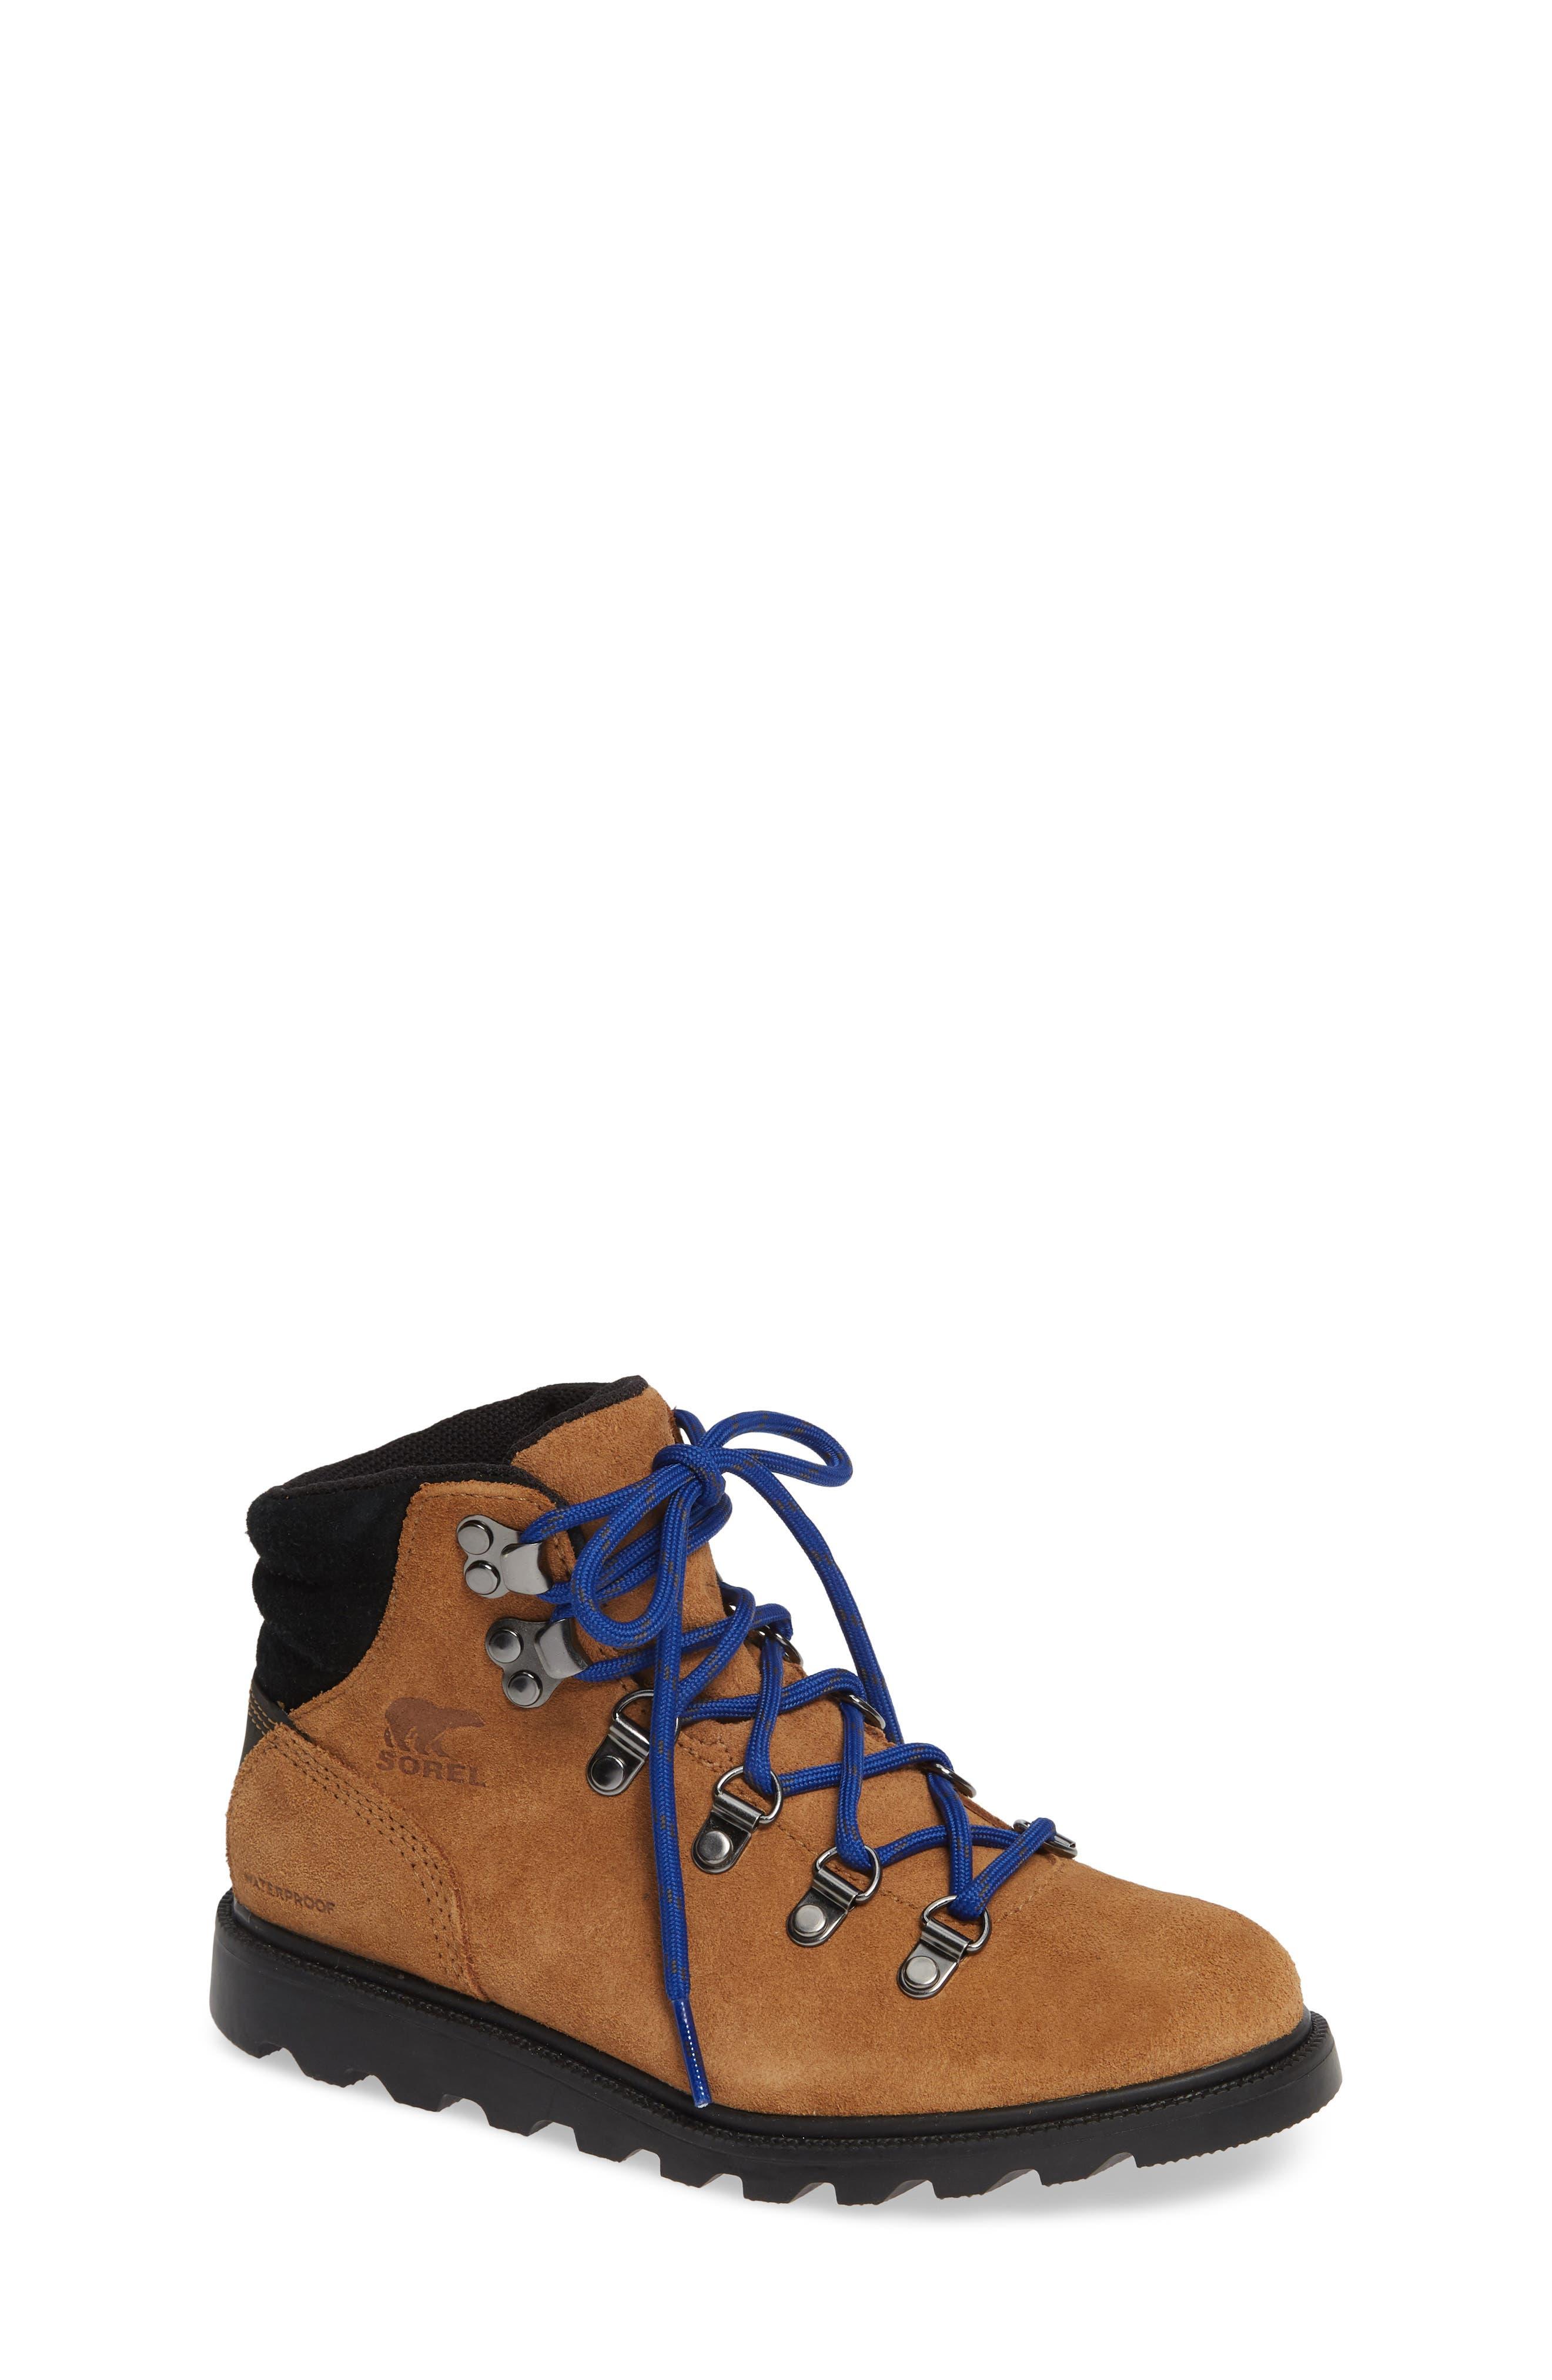 Image of Sorel Madison Lace-Up Waterproof Hiking Boot